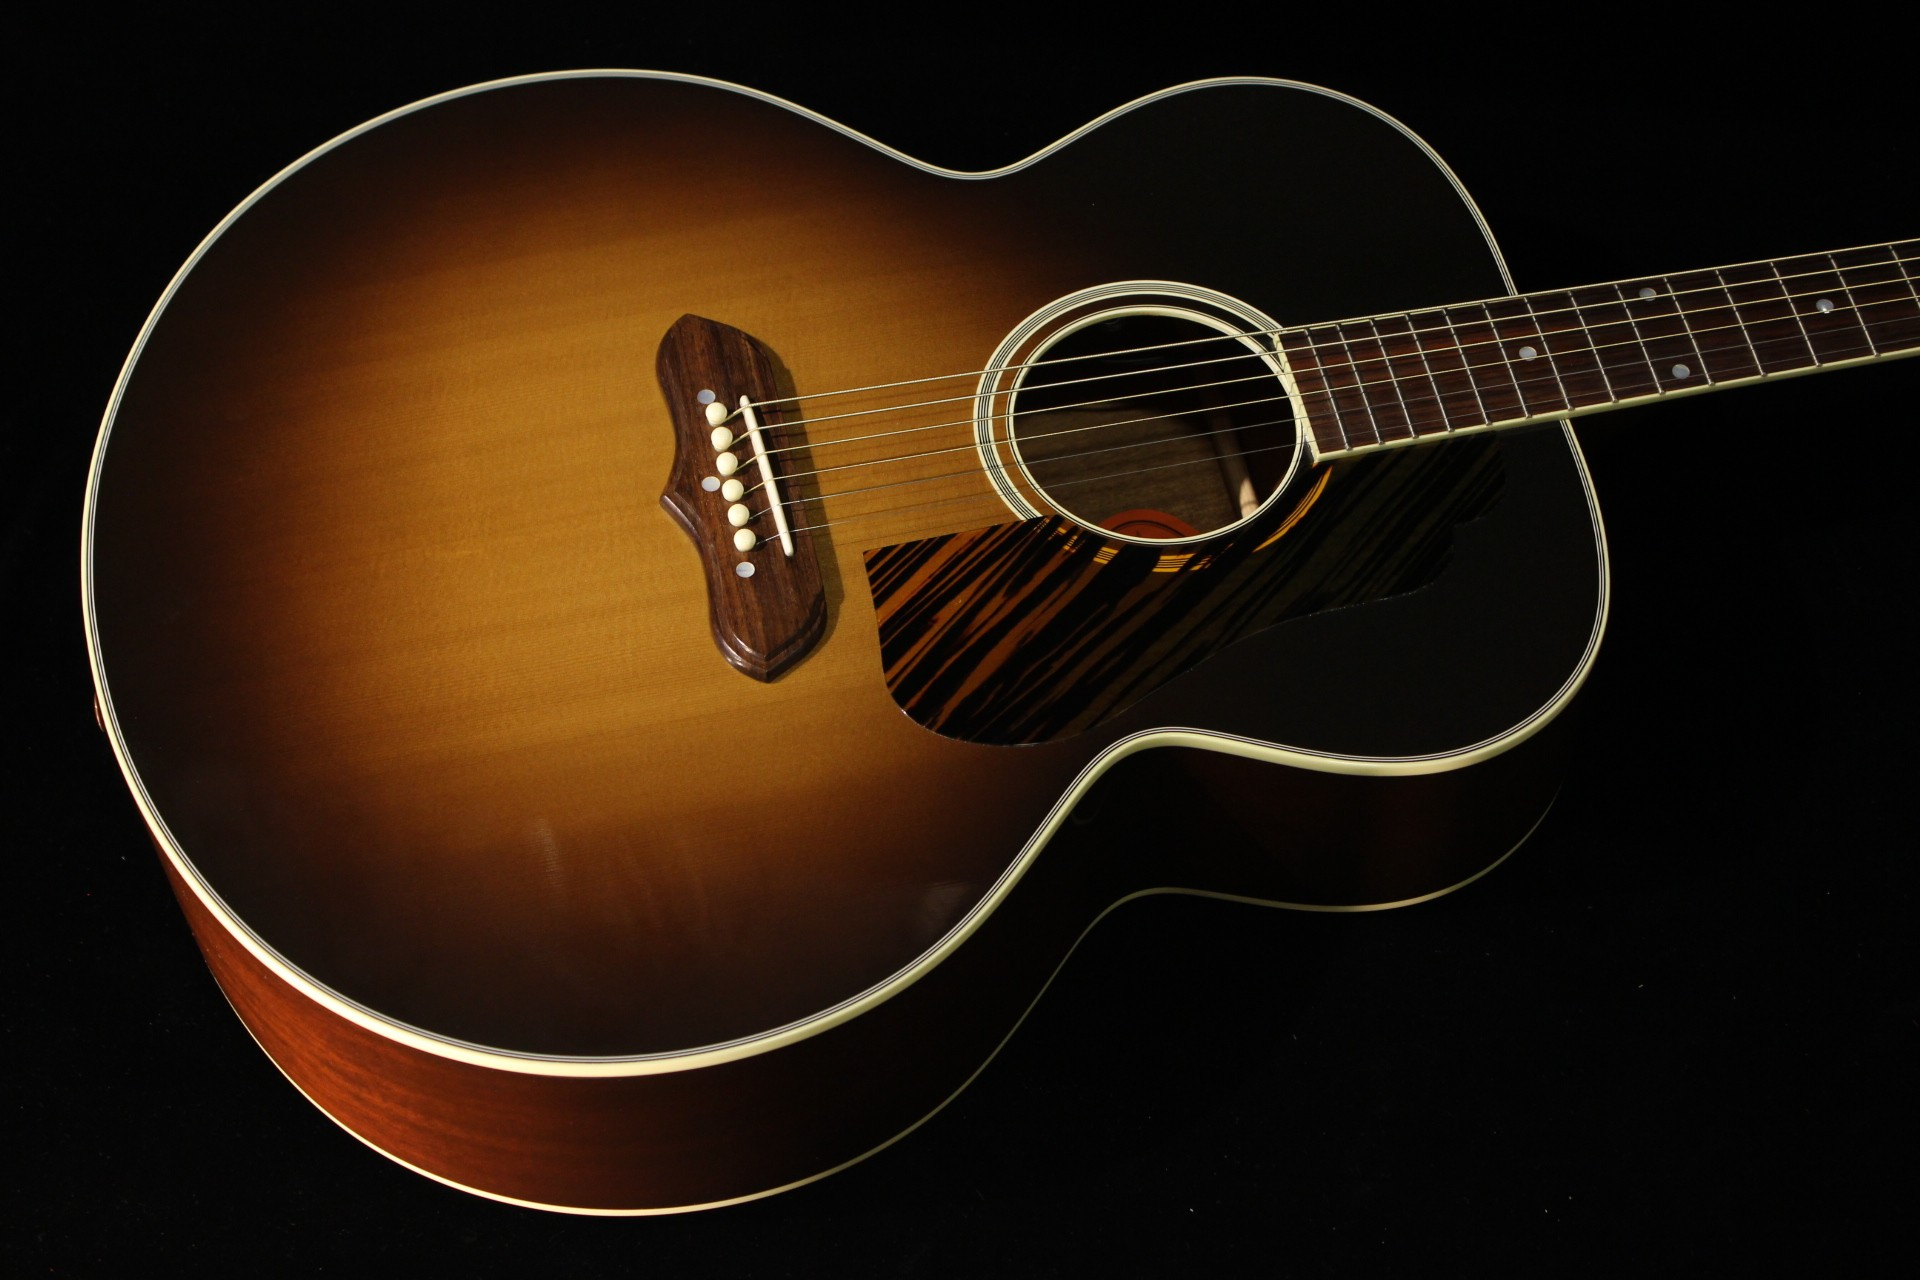 gibson 1941 sj 100 vintage sunburst sn 10303039 gino guitars. Black Bedroom Furniture Sets. Home Design Ideas